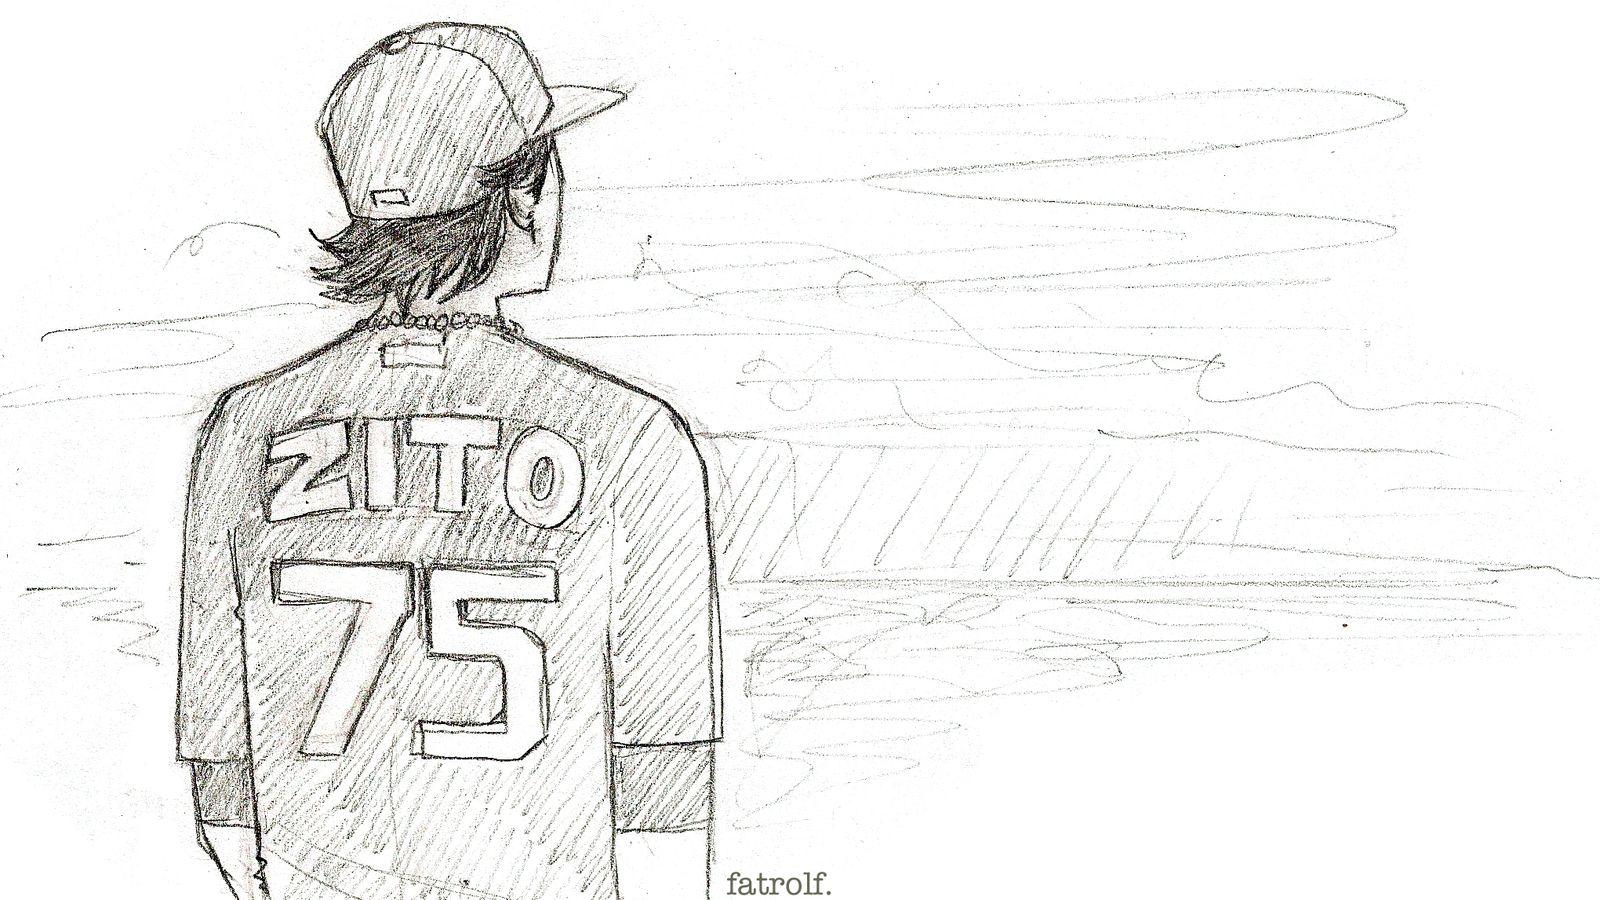 Zito_sketch_wo_text.0.0